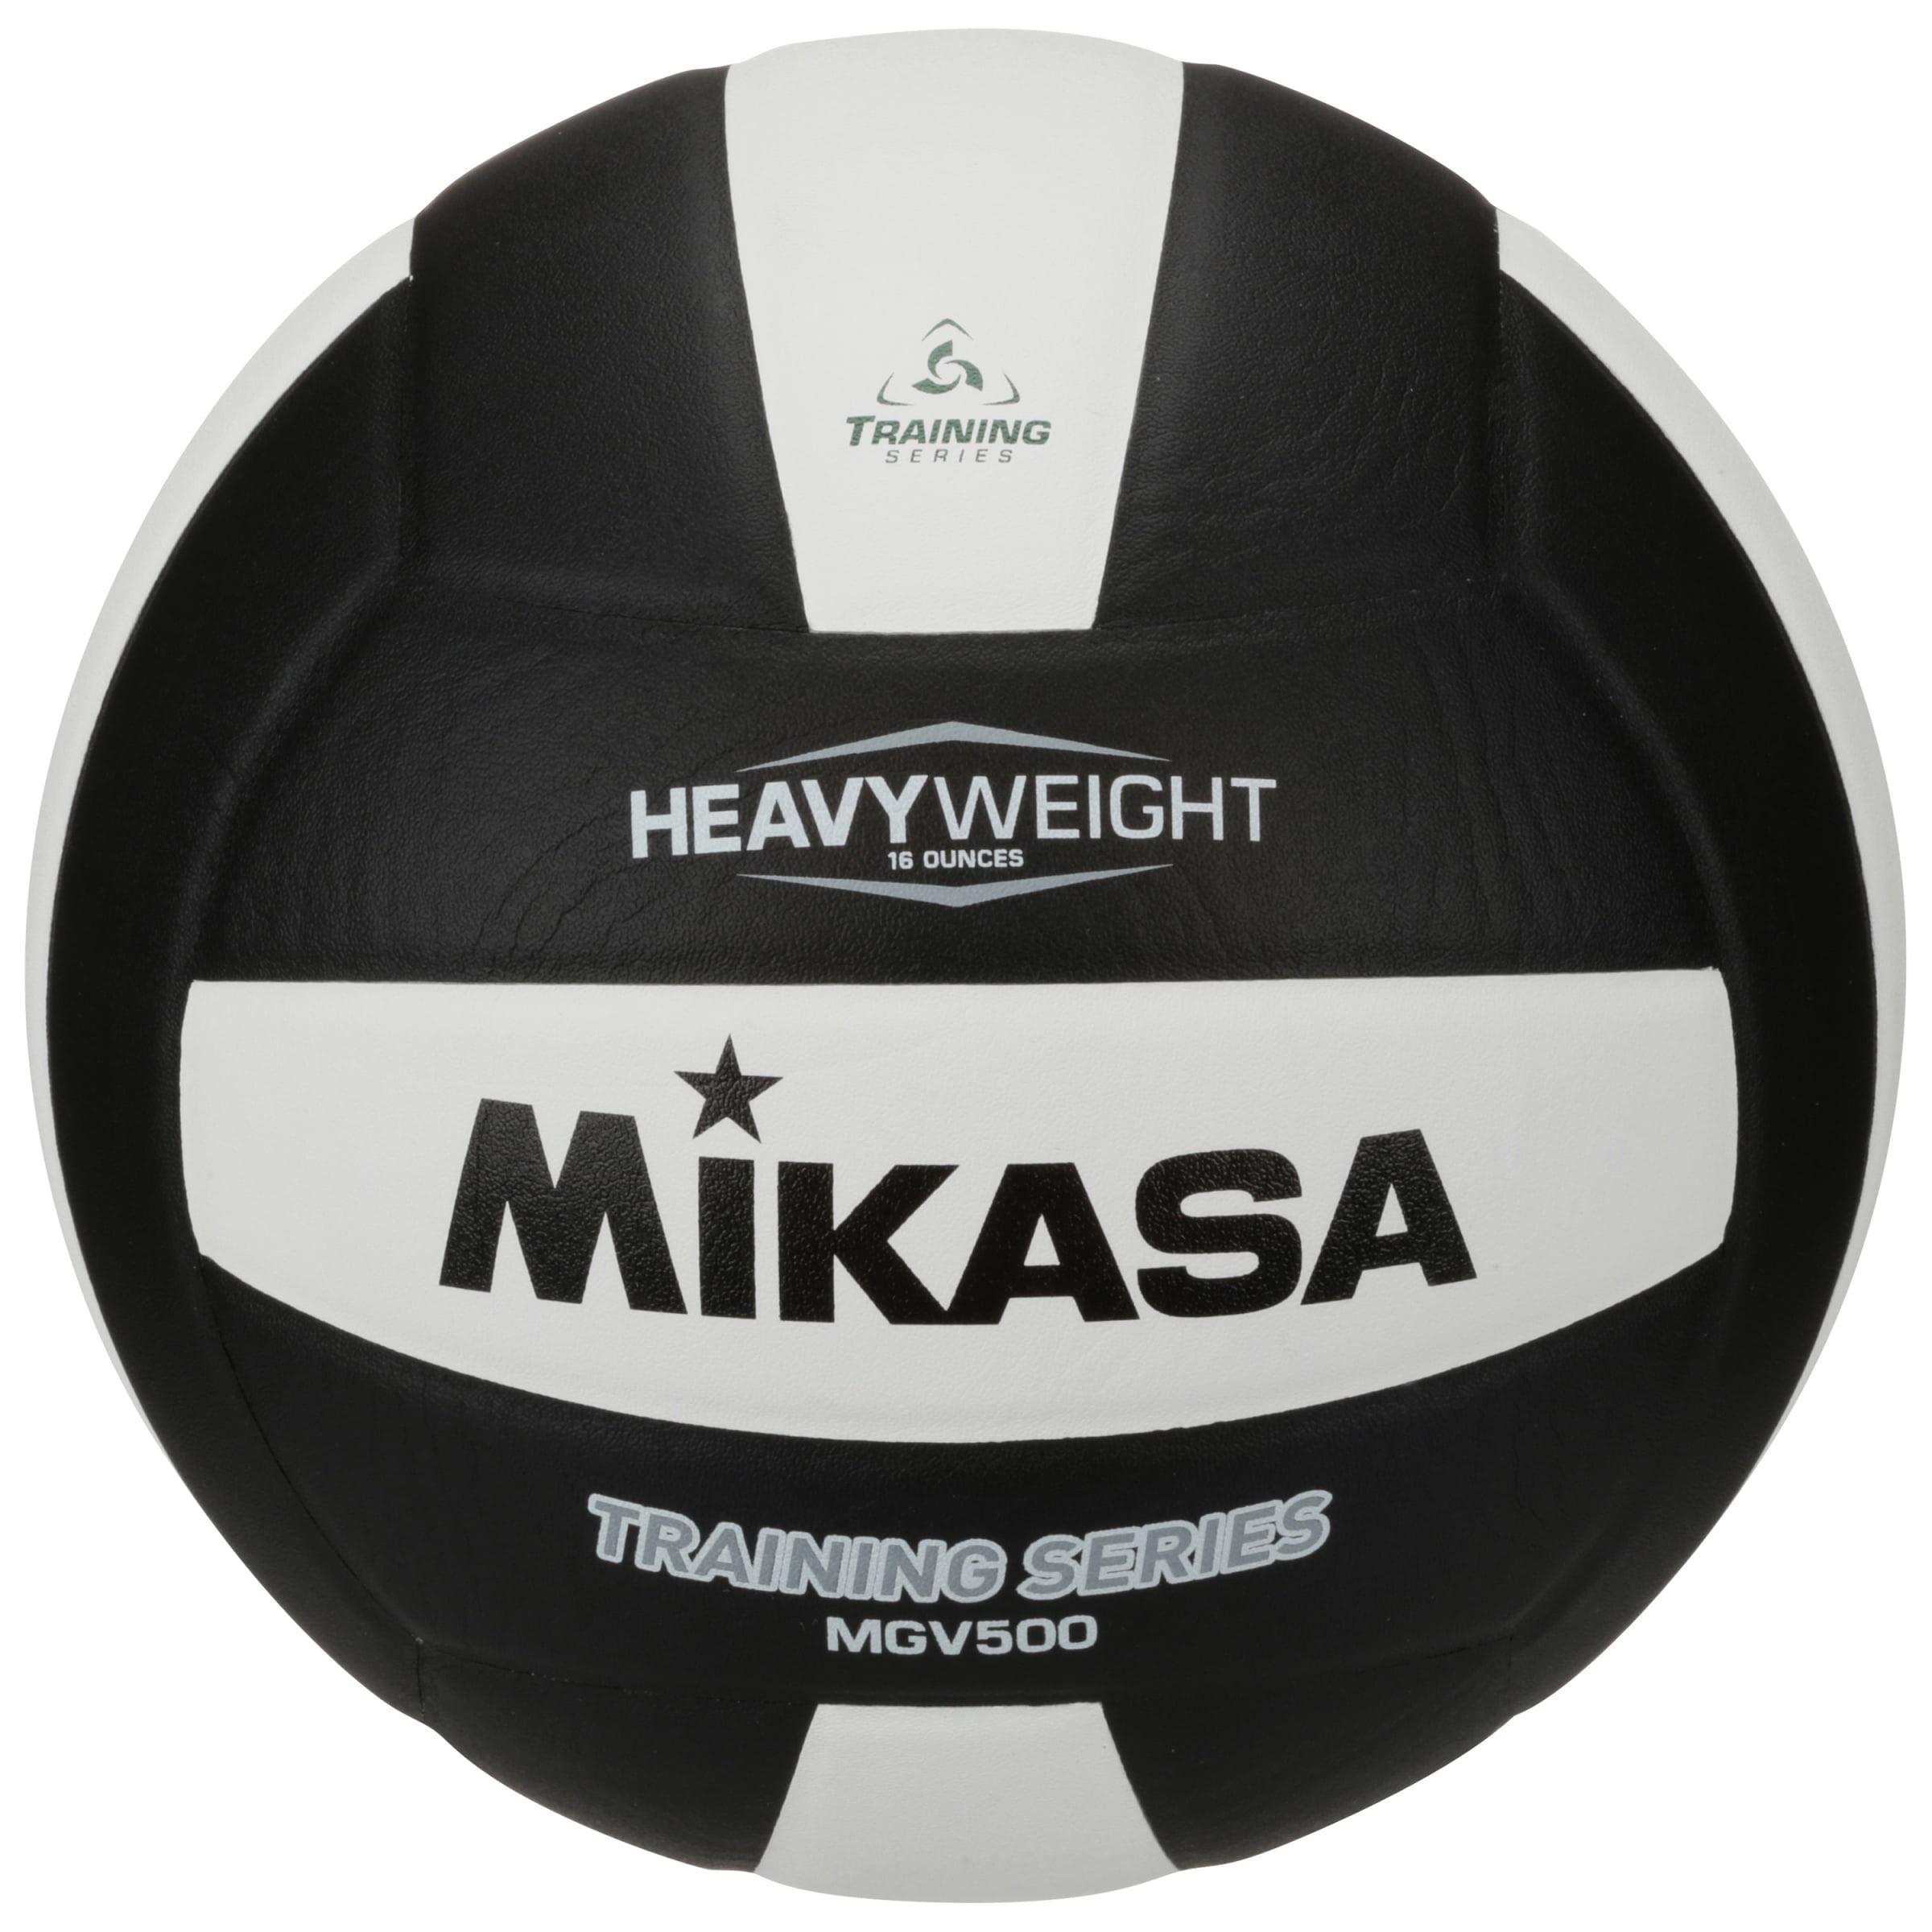 Mikasa Training Series Heavy Weight Indoor Volleyball